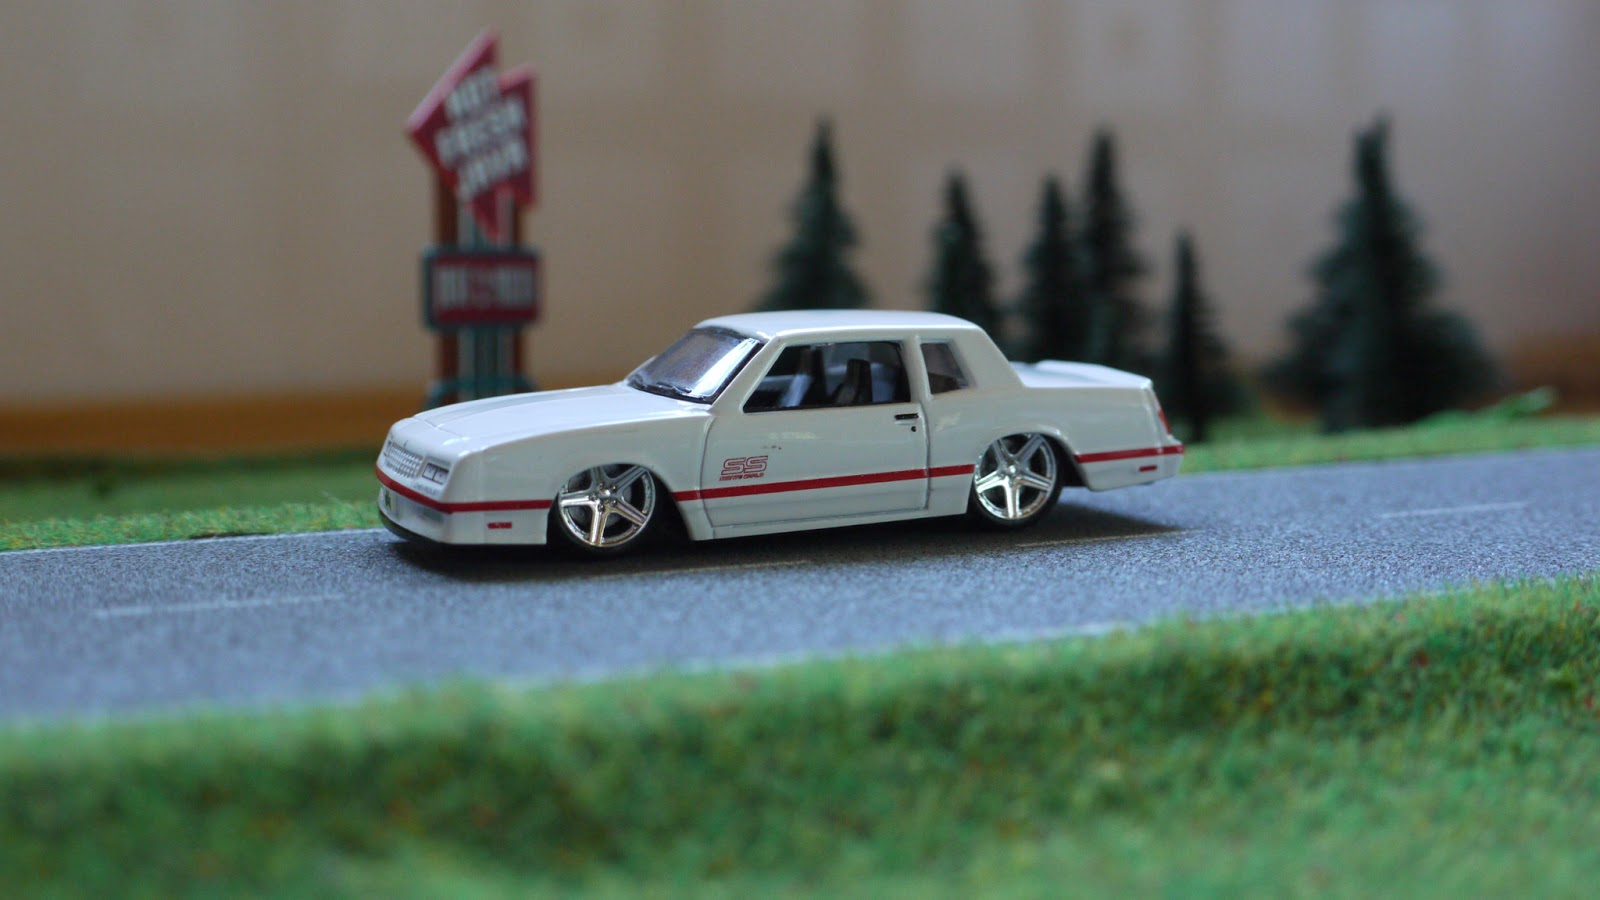 2016 Monte Carlo Ss >> Diecast cars 1/64, Modellautos 1:64, Modellbilar 1:64: Chevrolet Monte Carlo